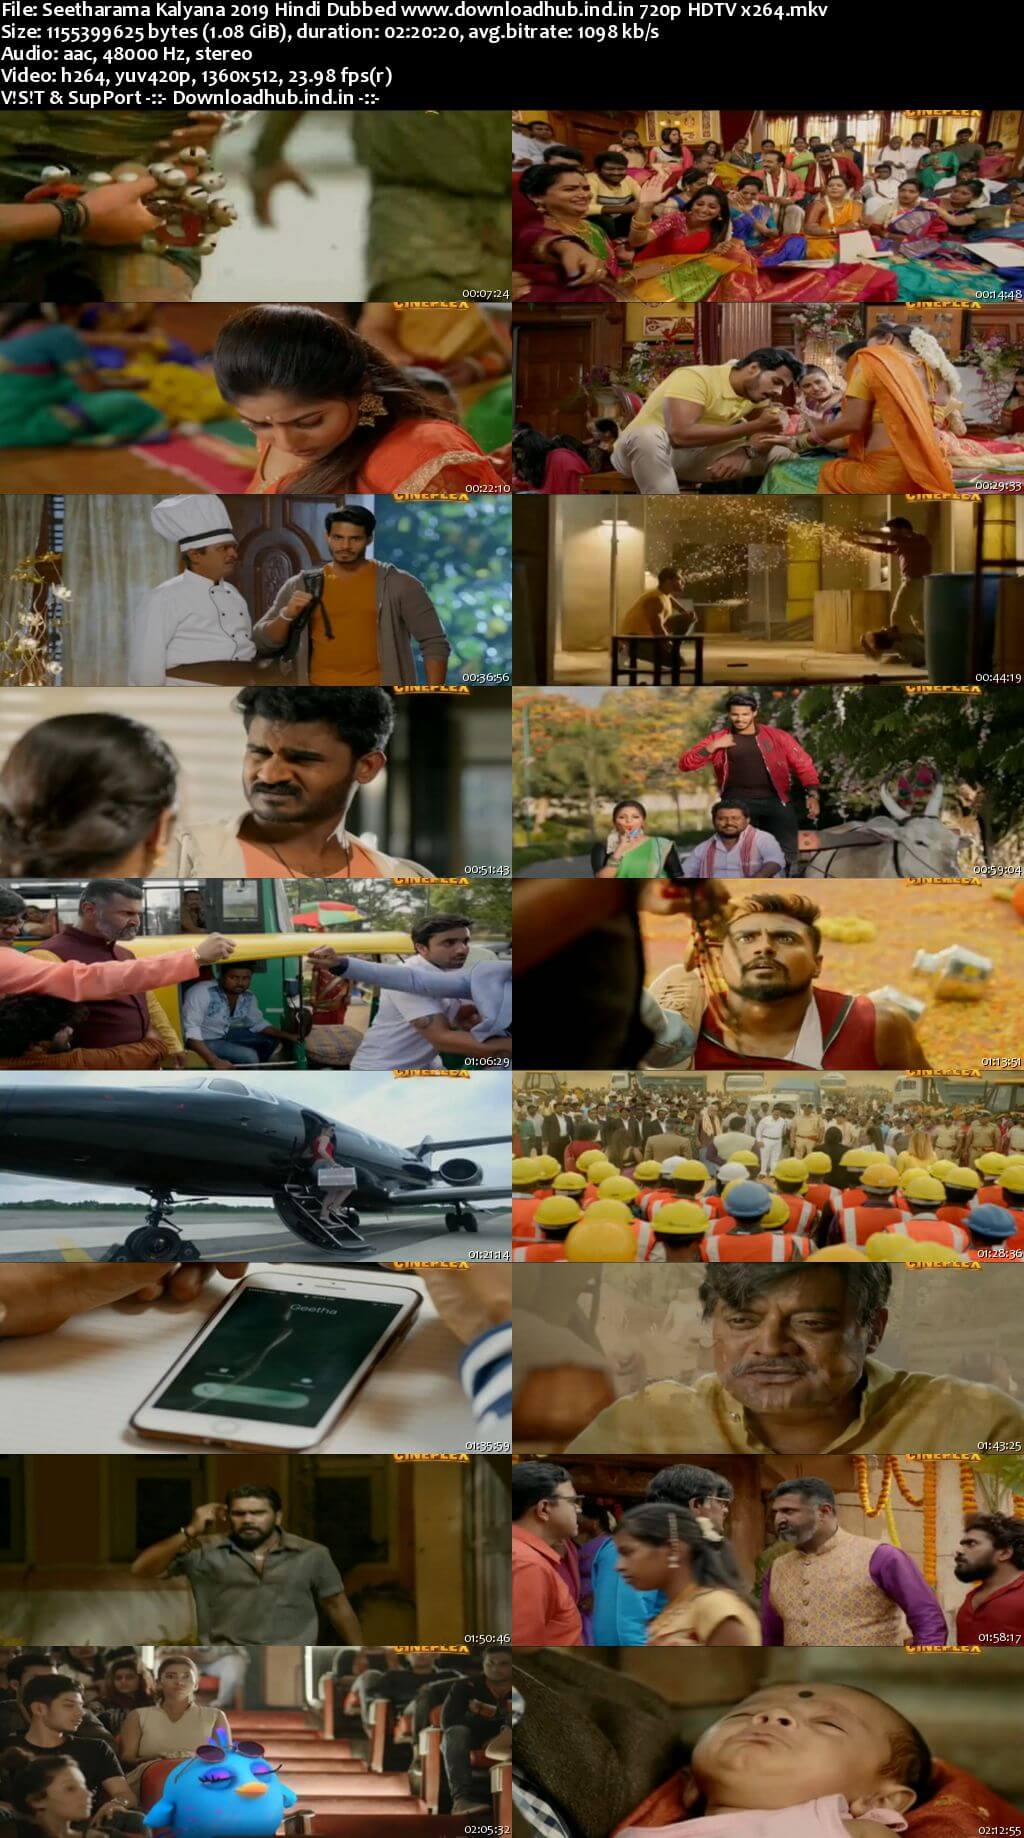 Seetharama Kalyana 2019 Hindi Dubbed 720p HDTV x264